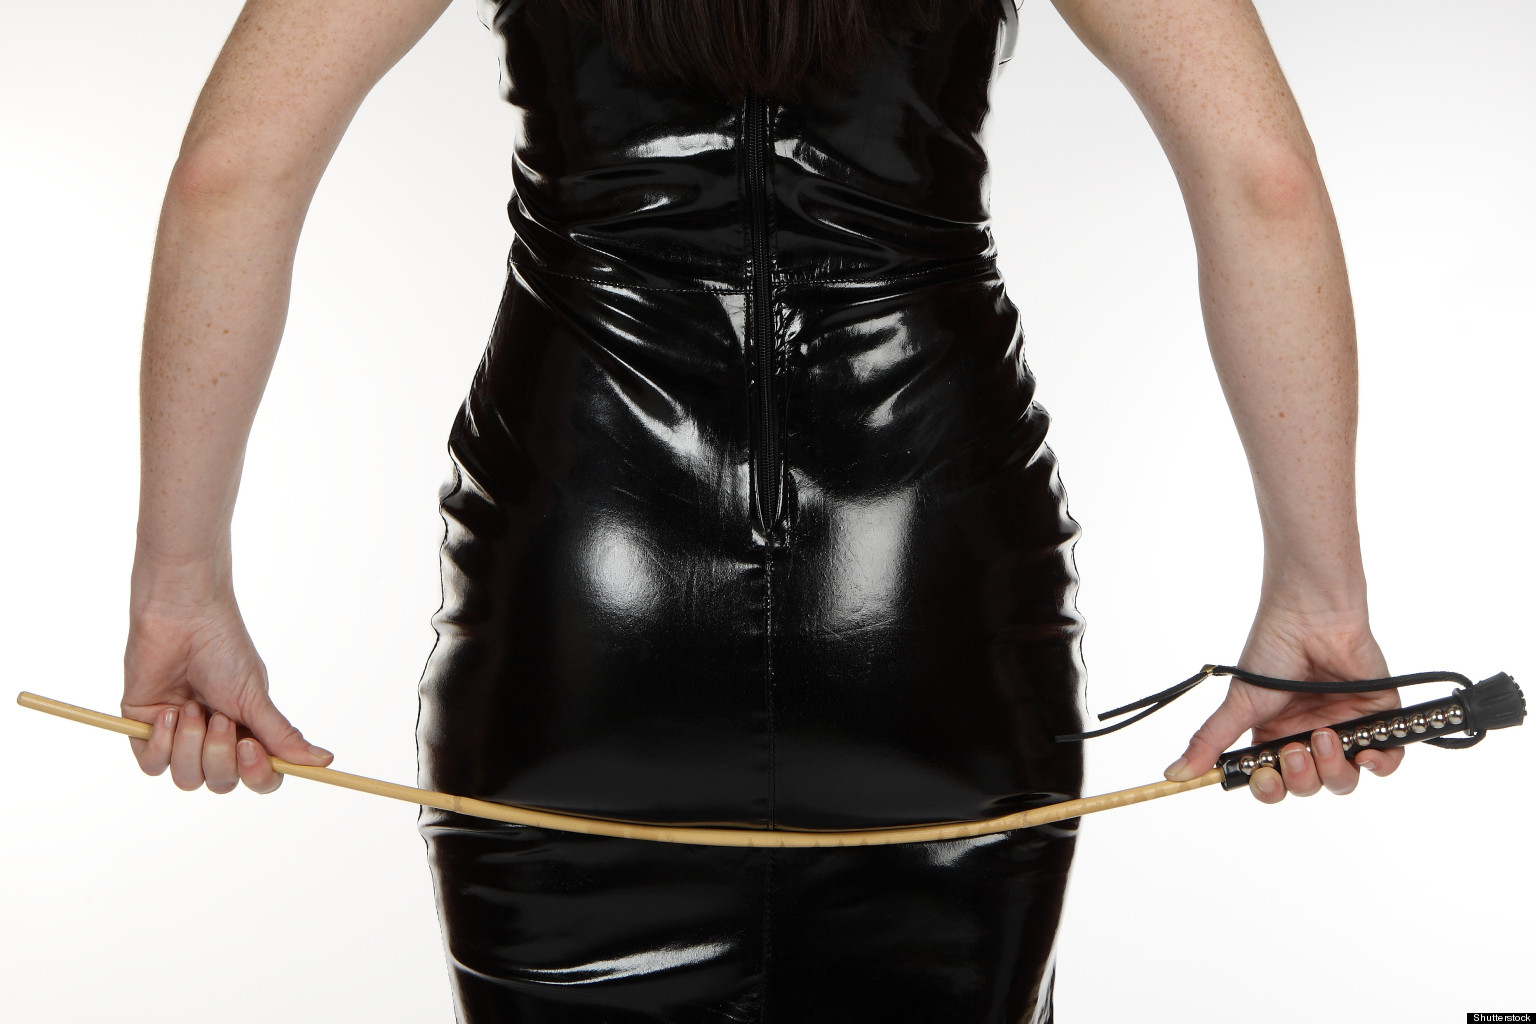 Tied up in pantyhose fantasy